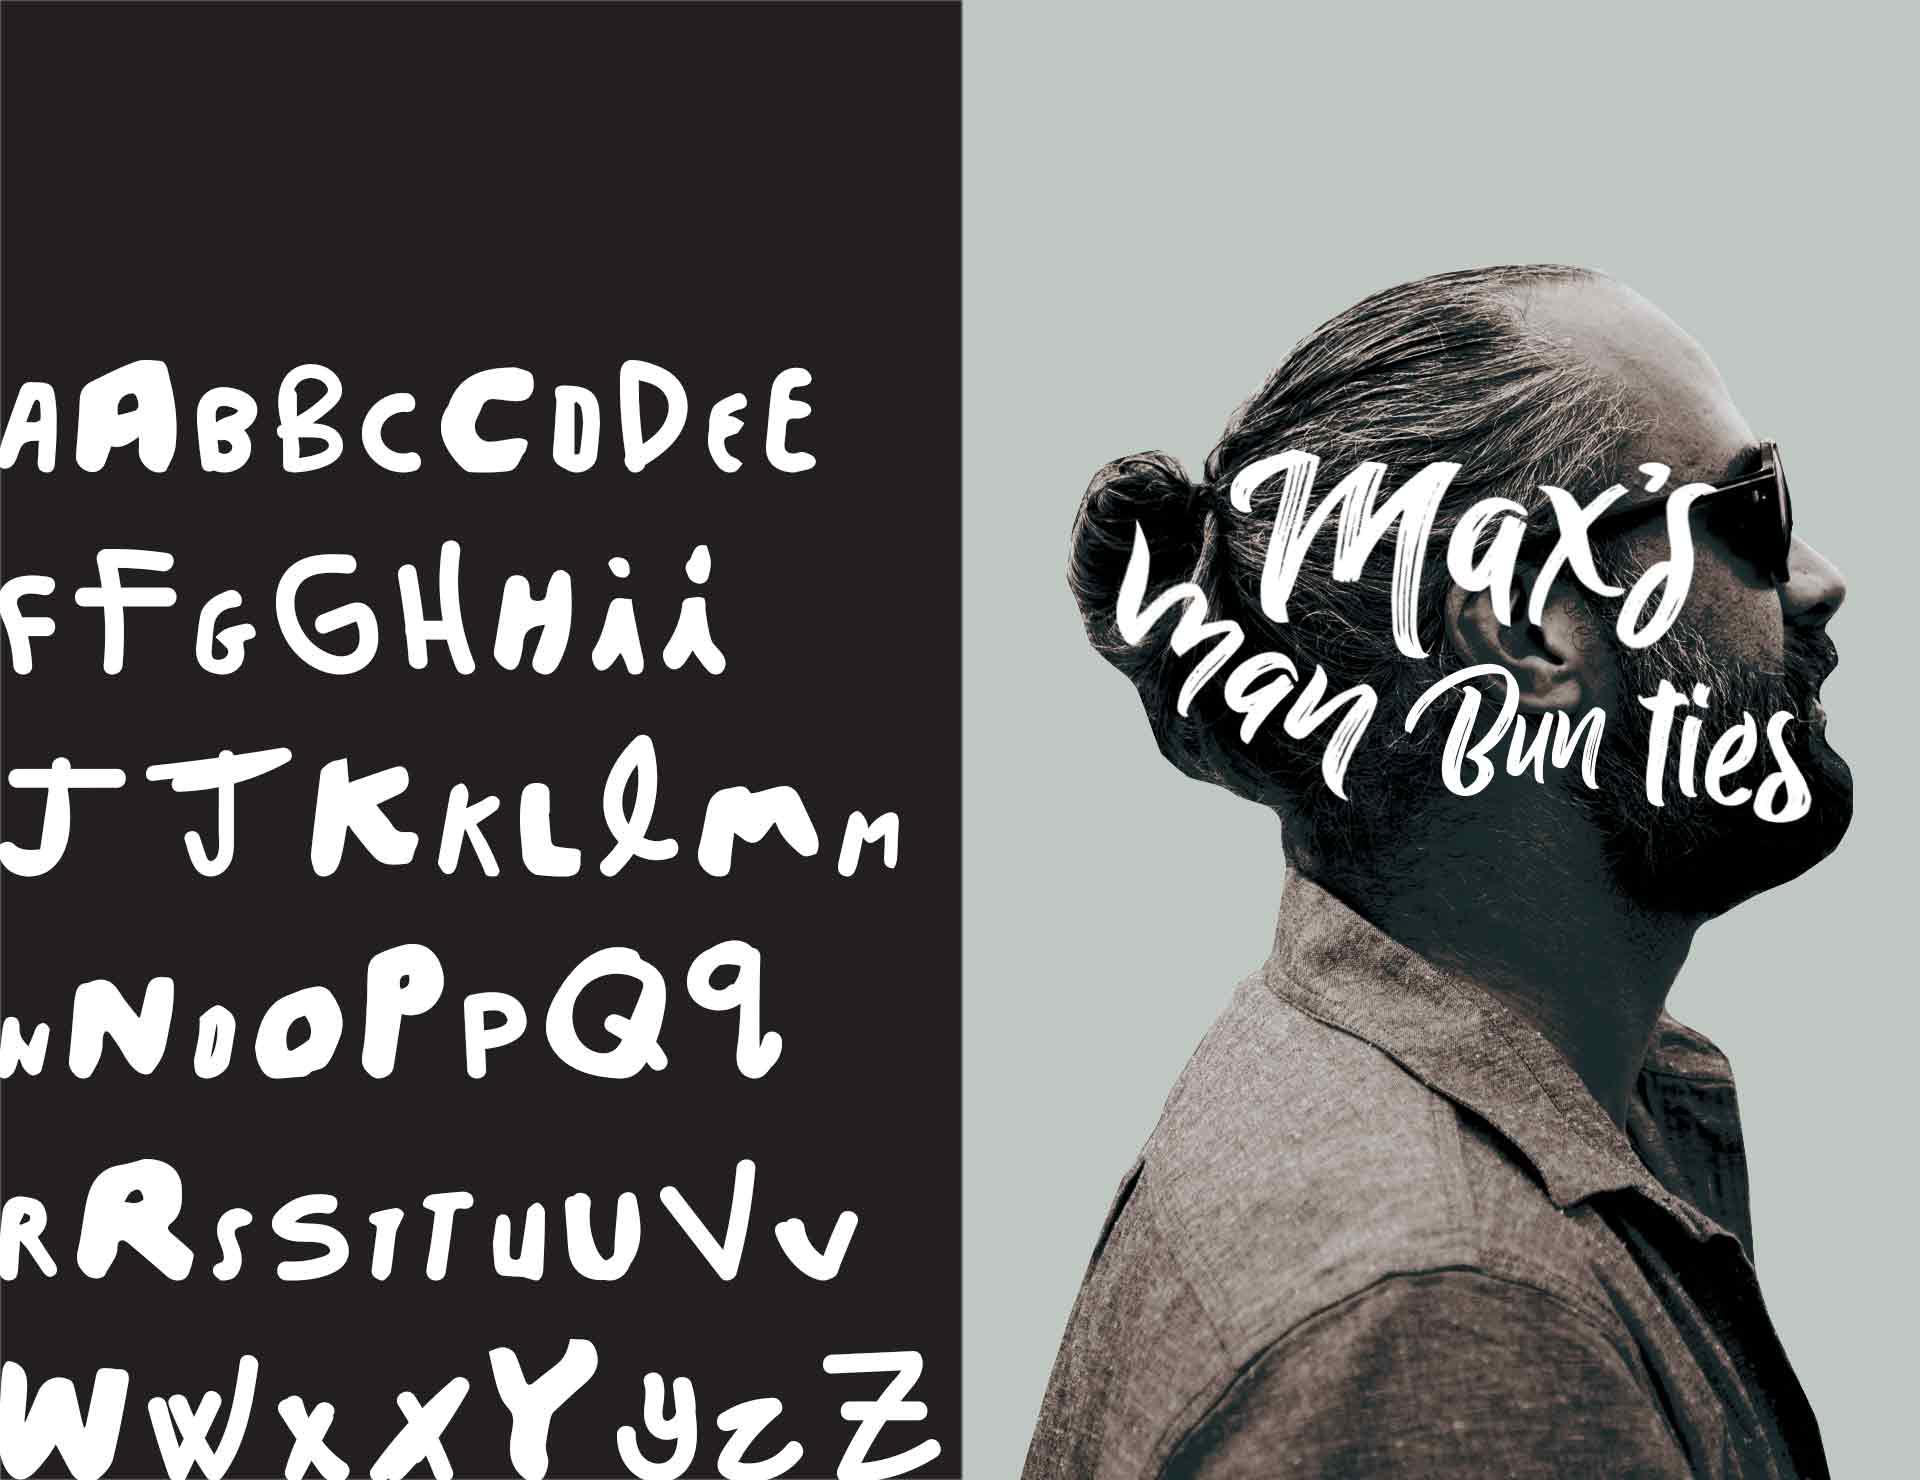 Maxs Man buns custom typography